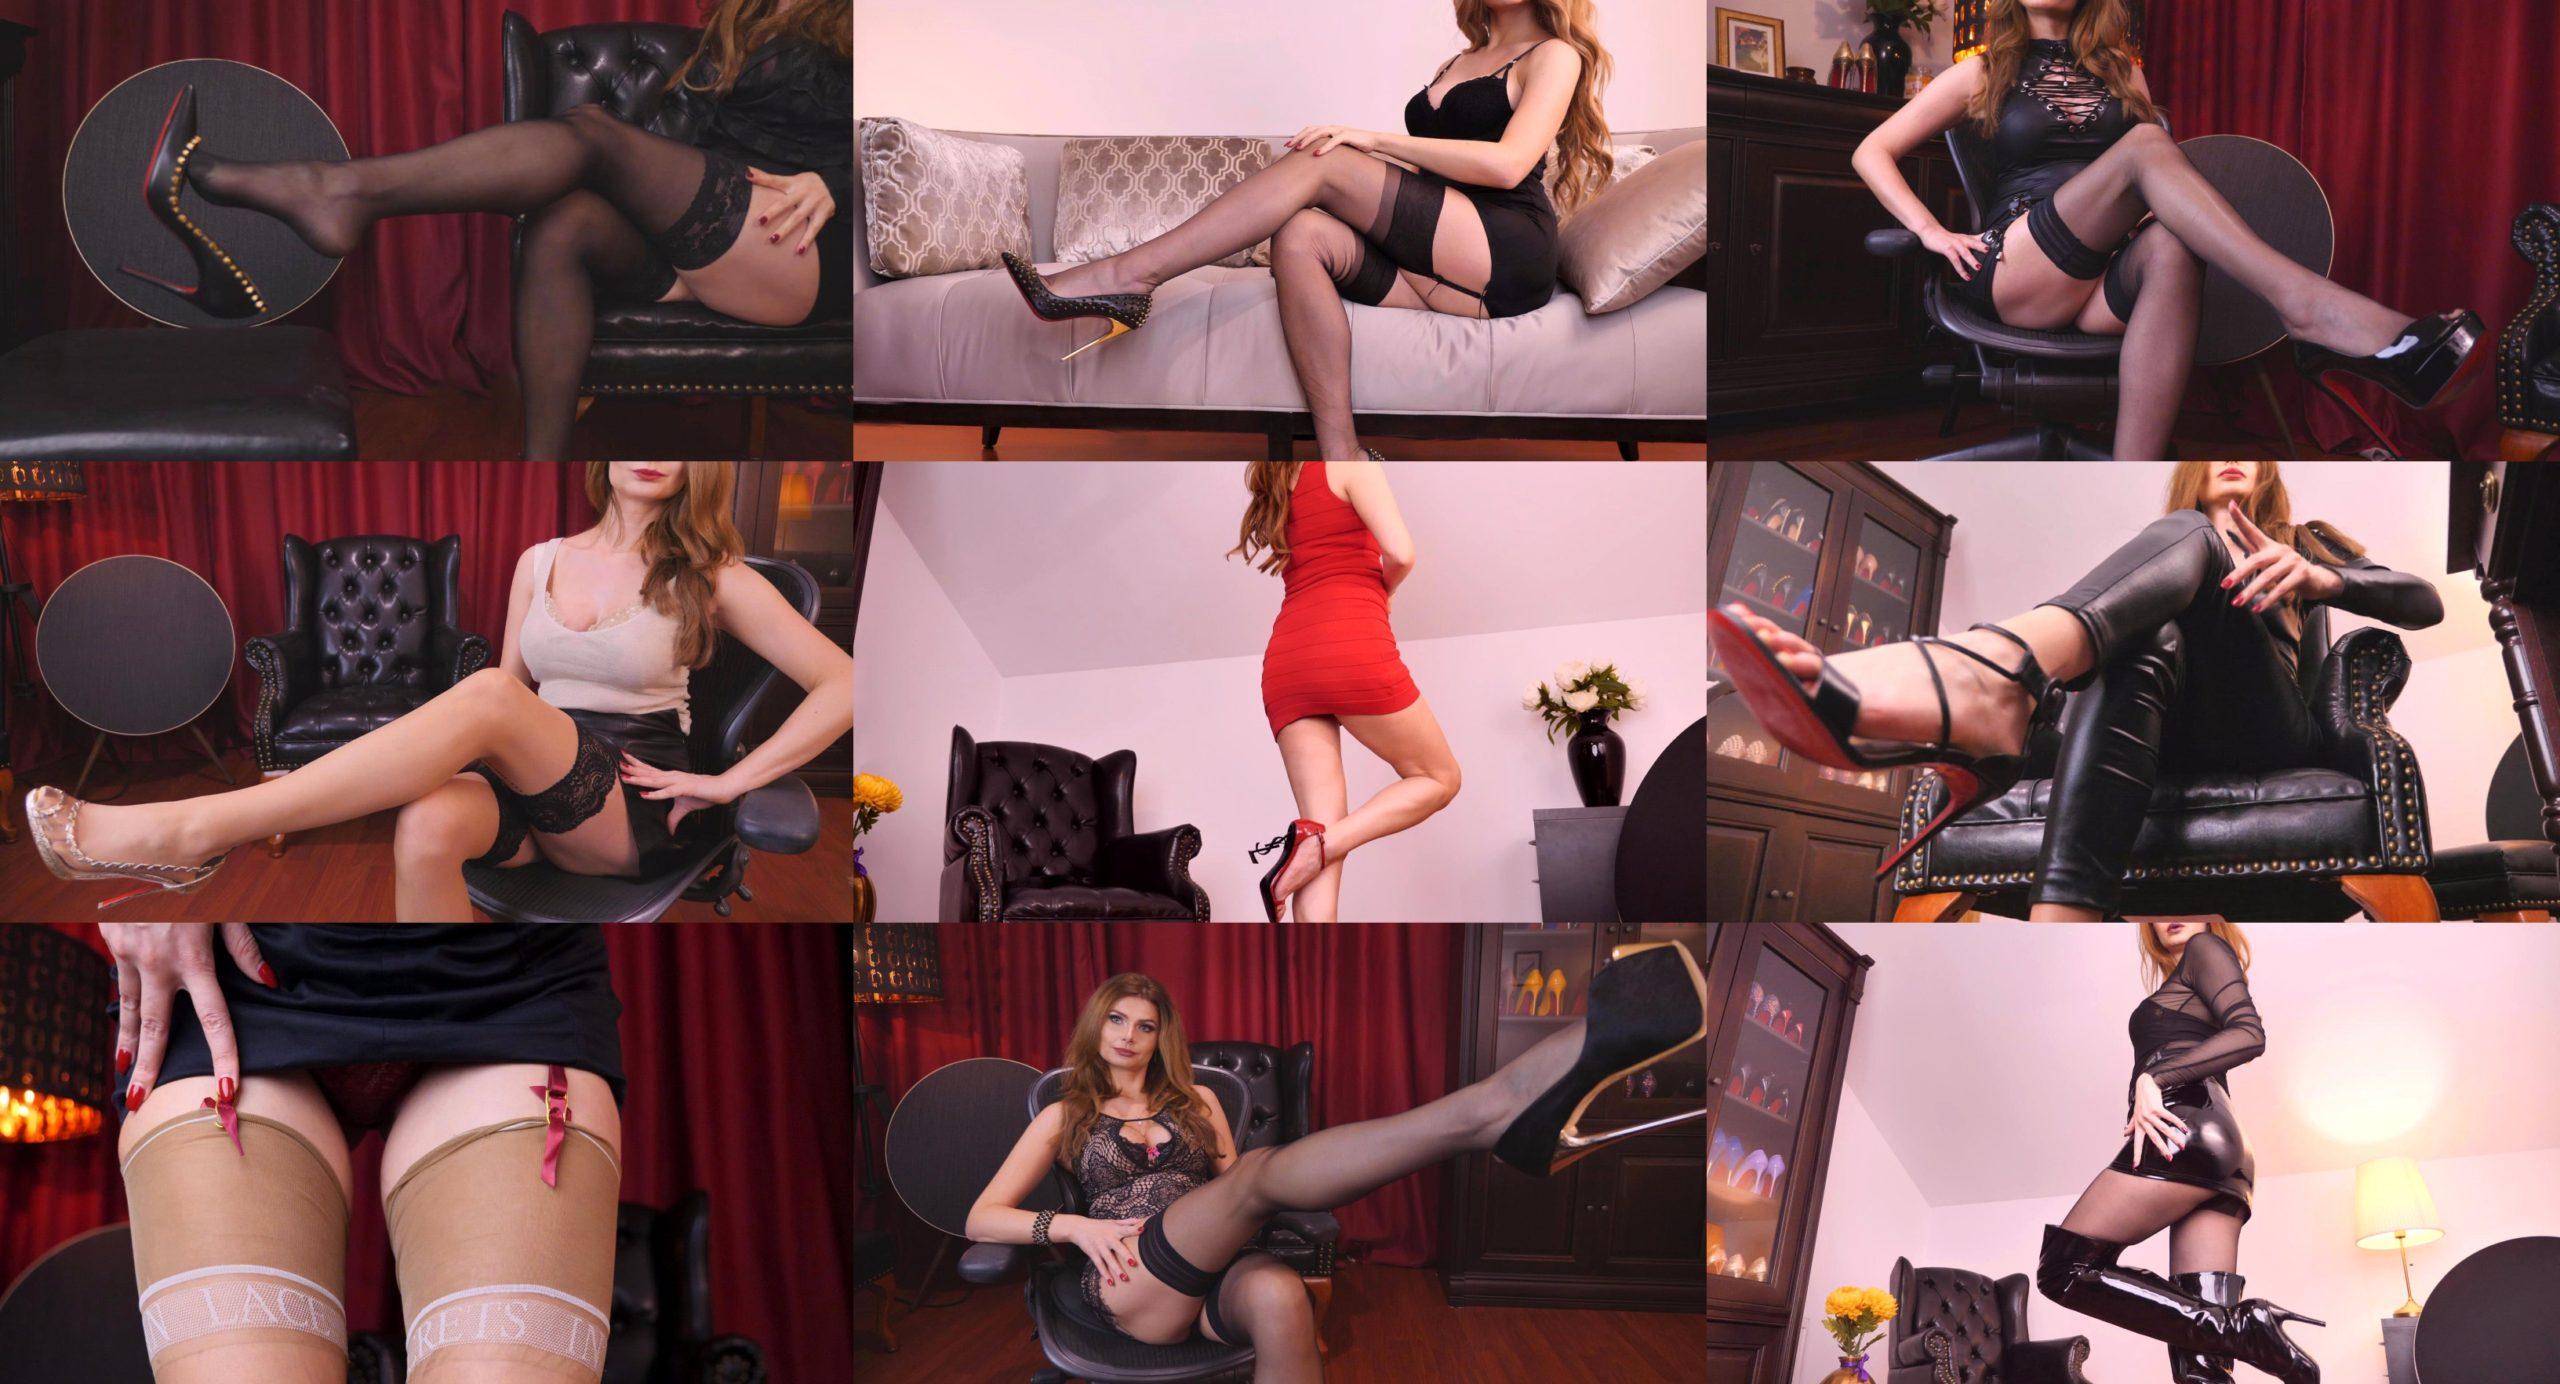 femdom Dominatrix online chat